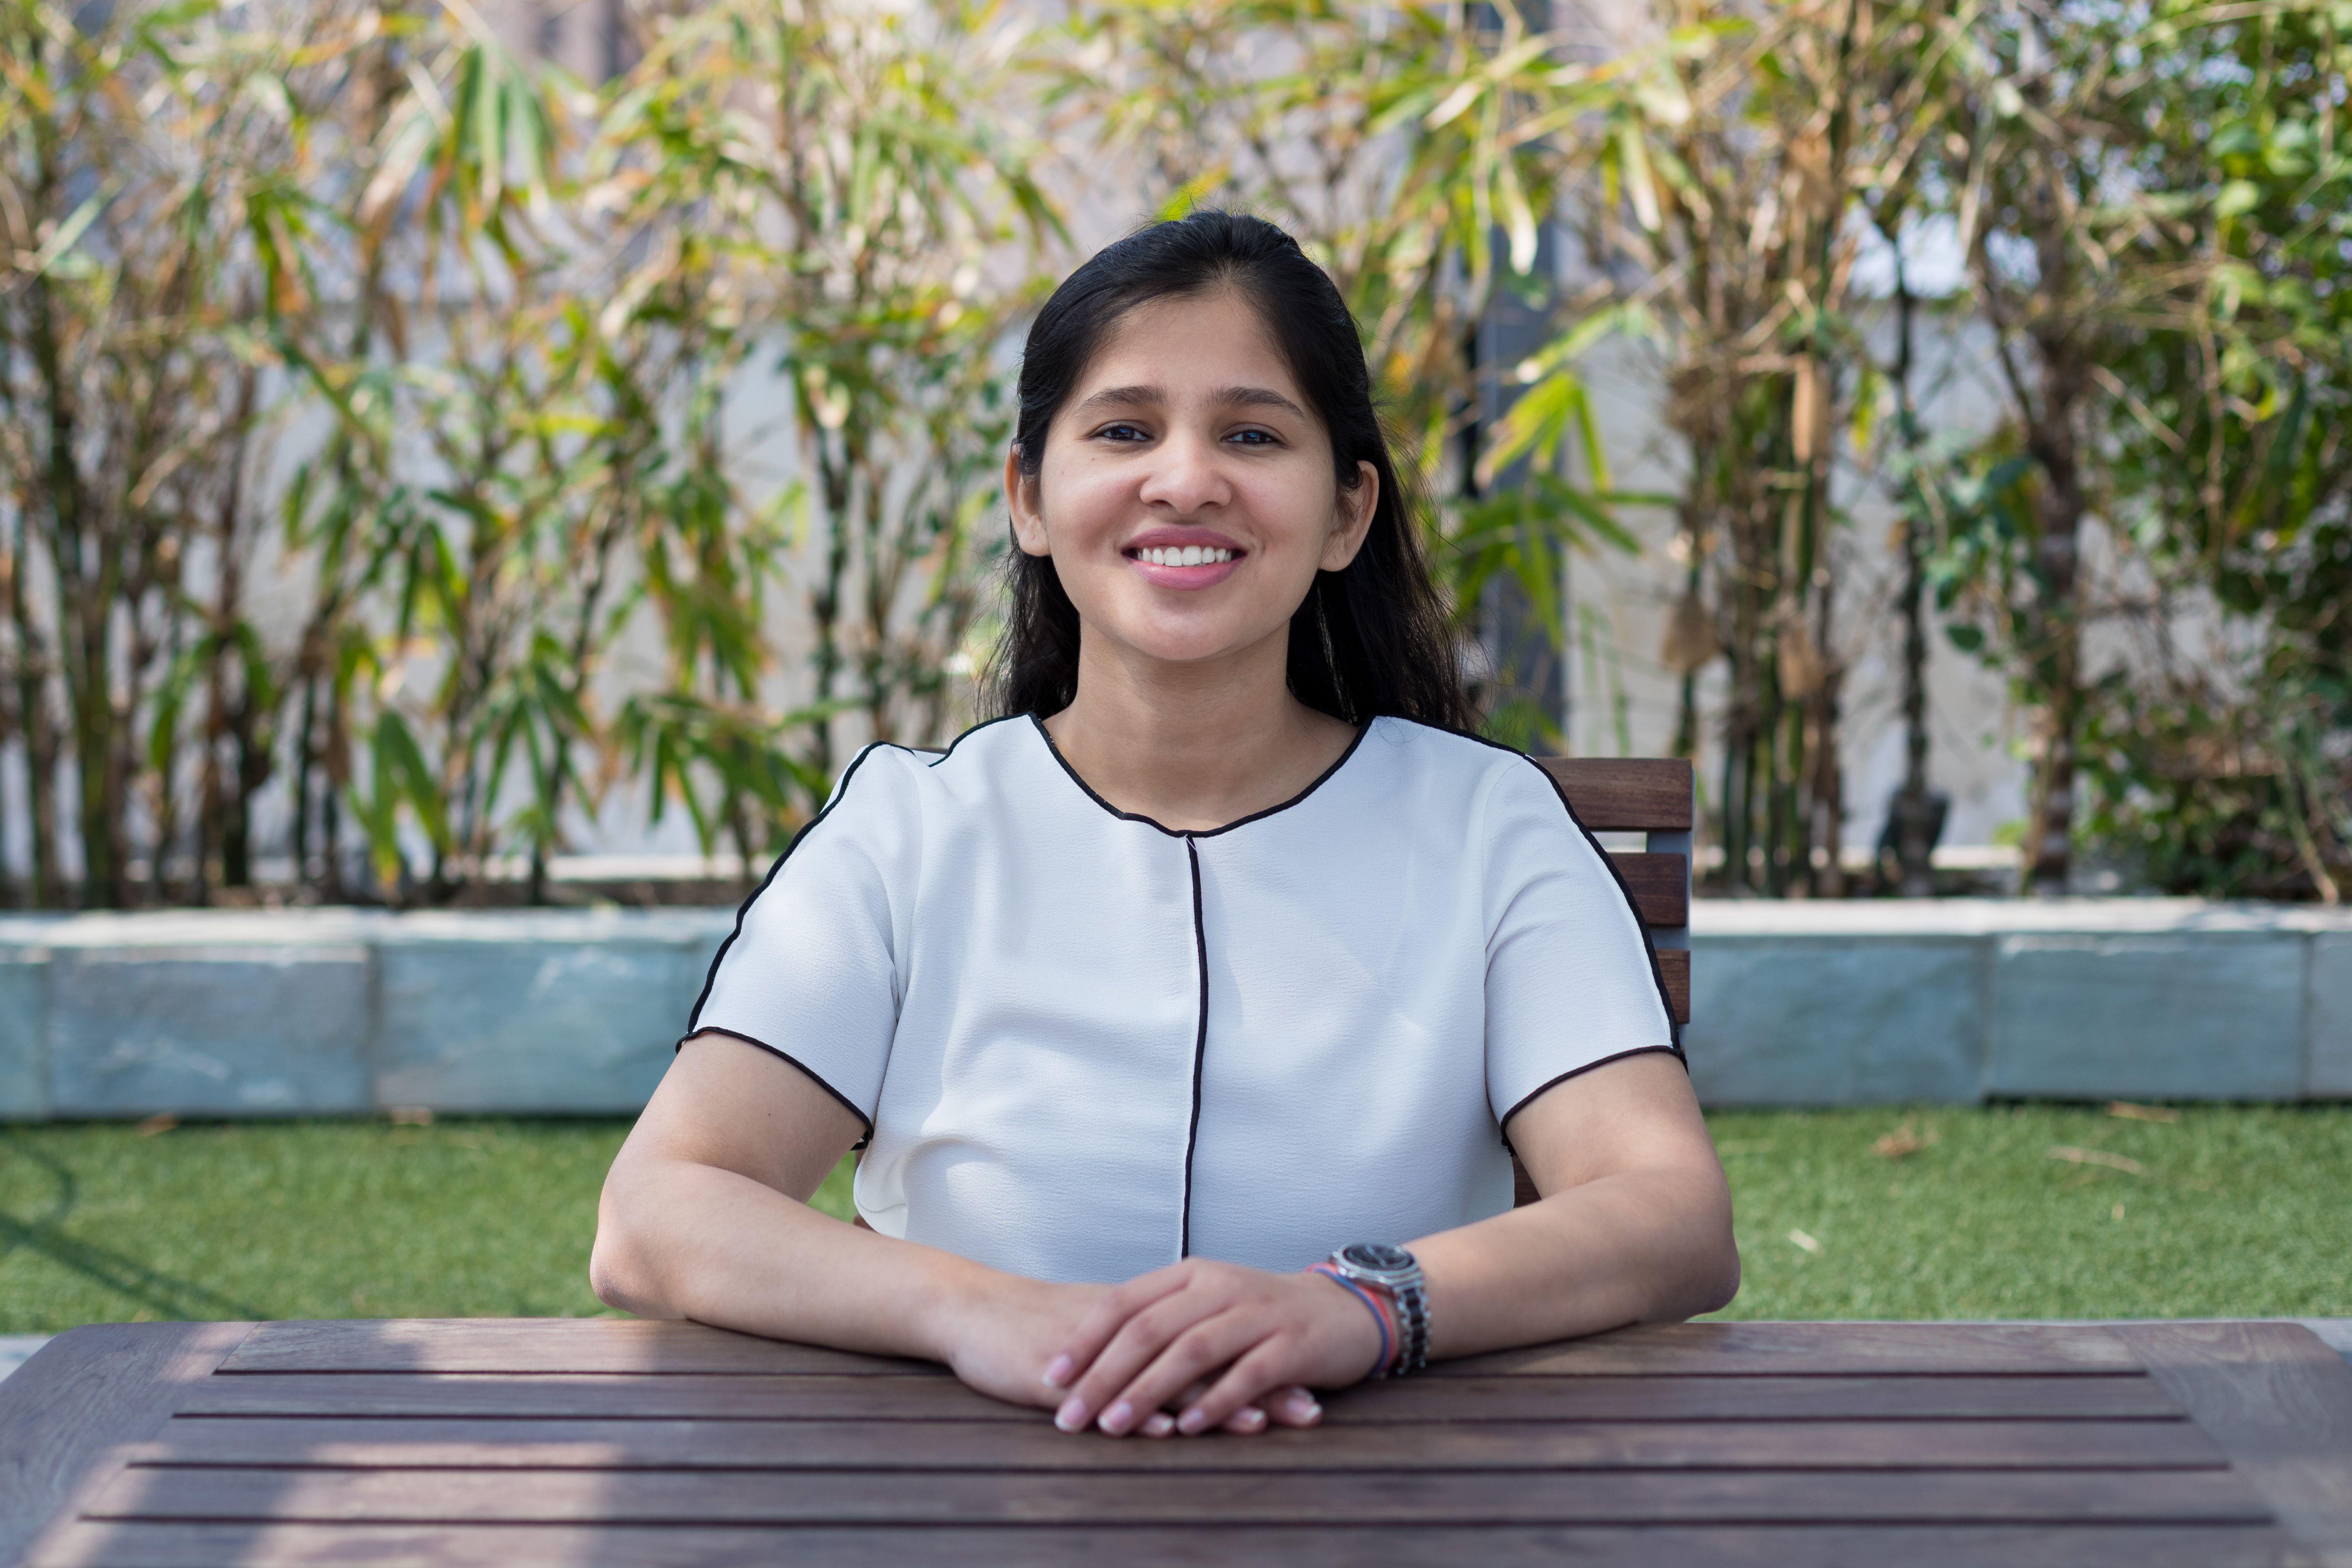 A photo of Sukriti Jiwarajka